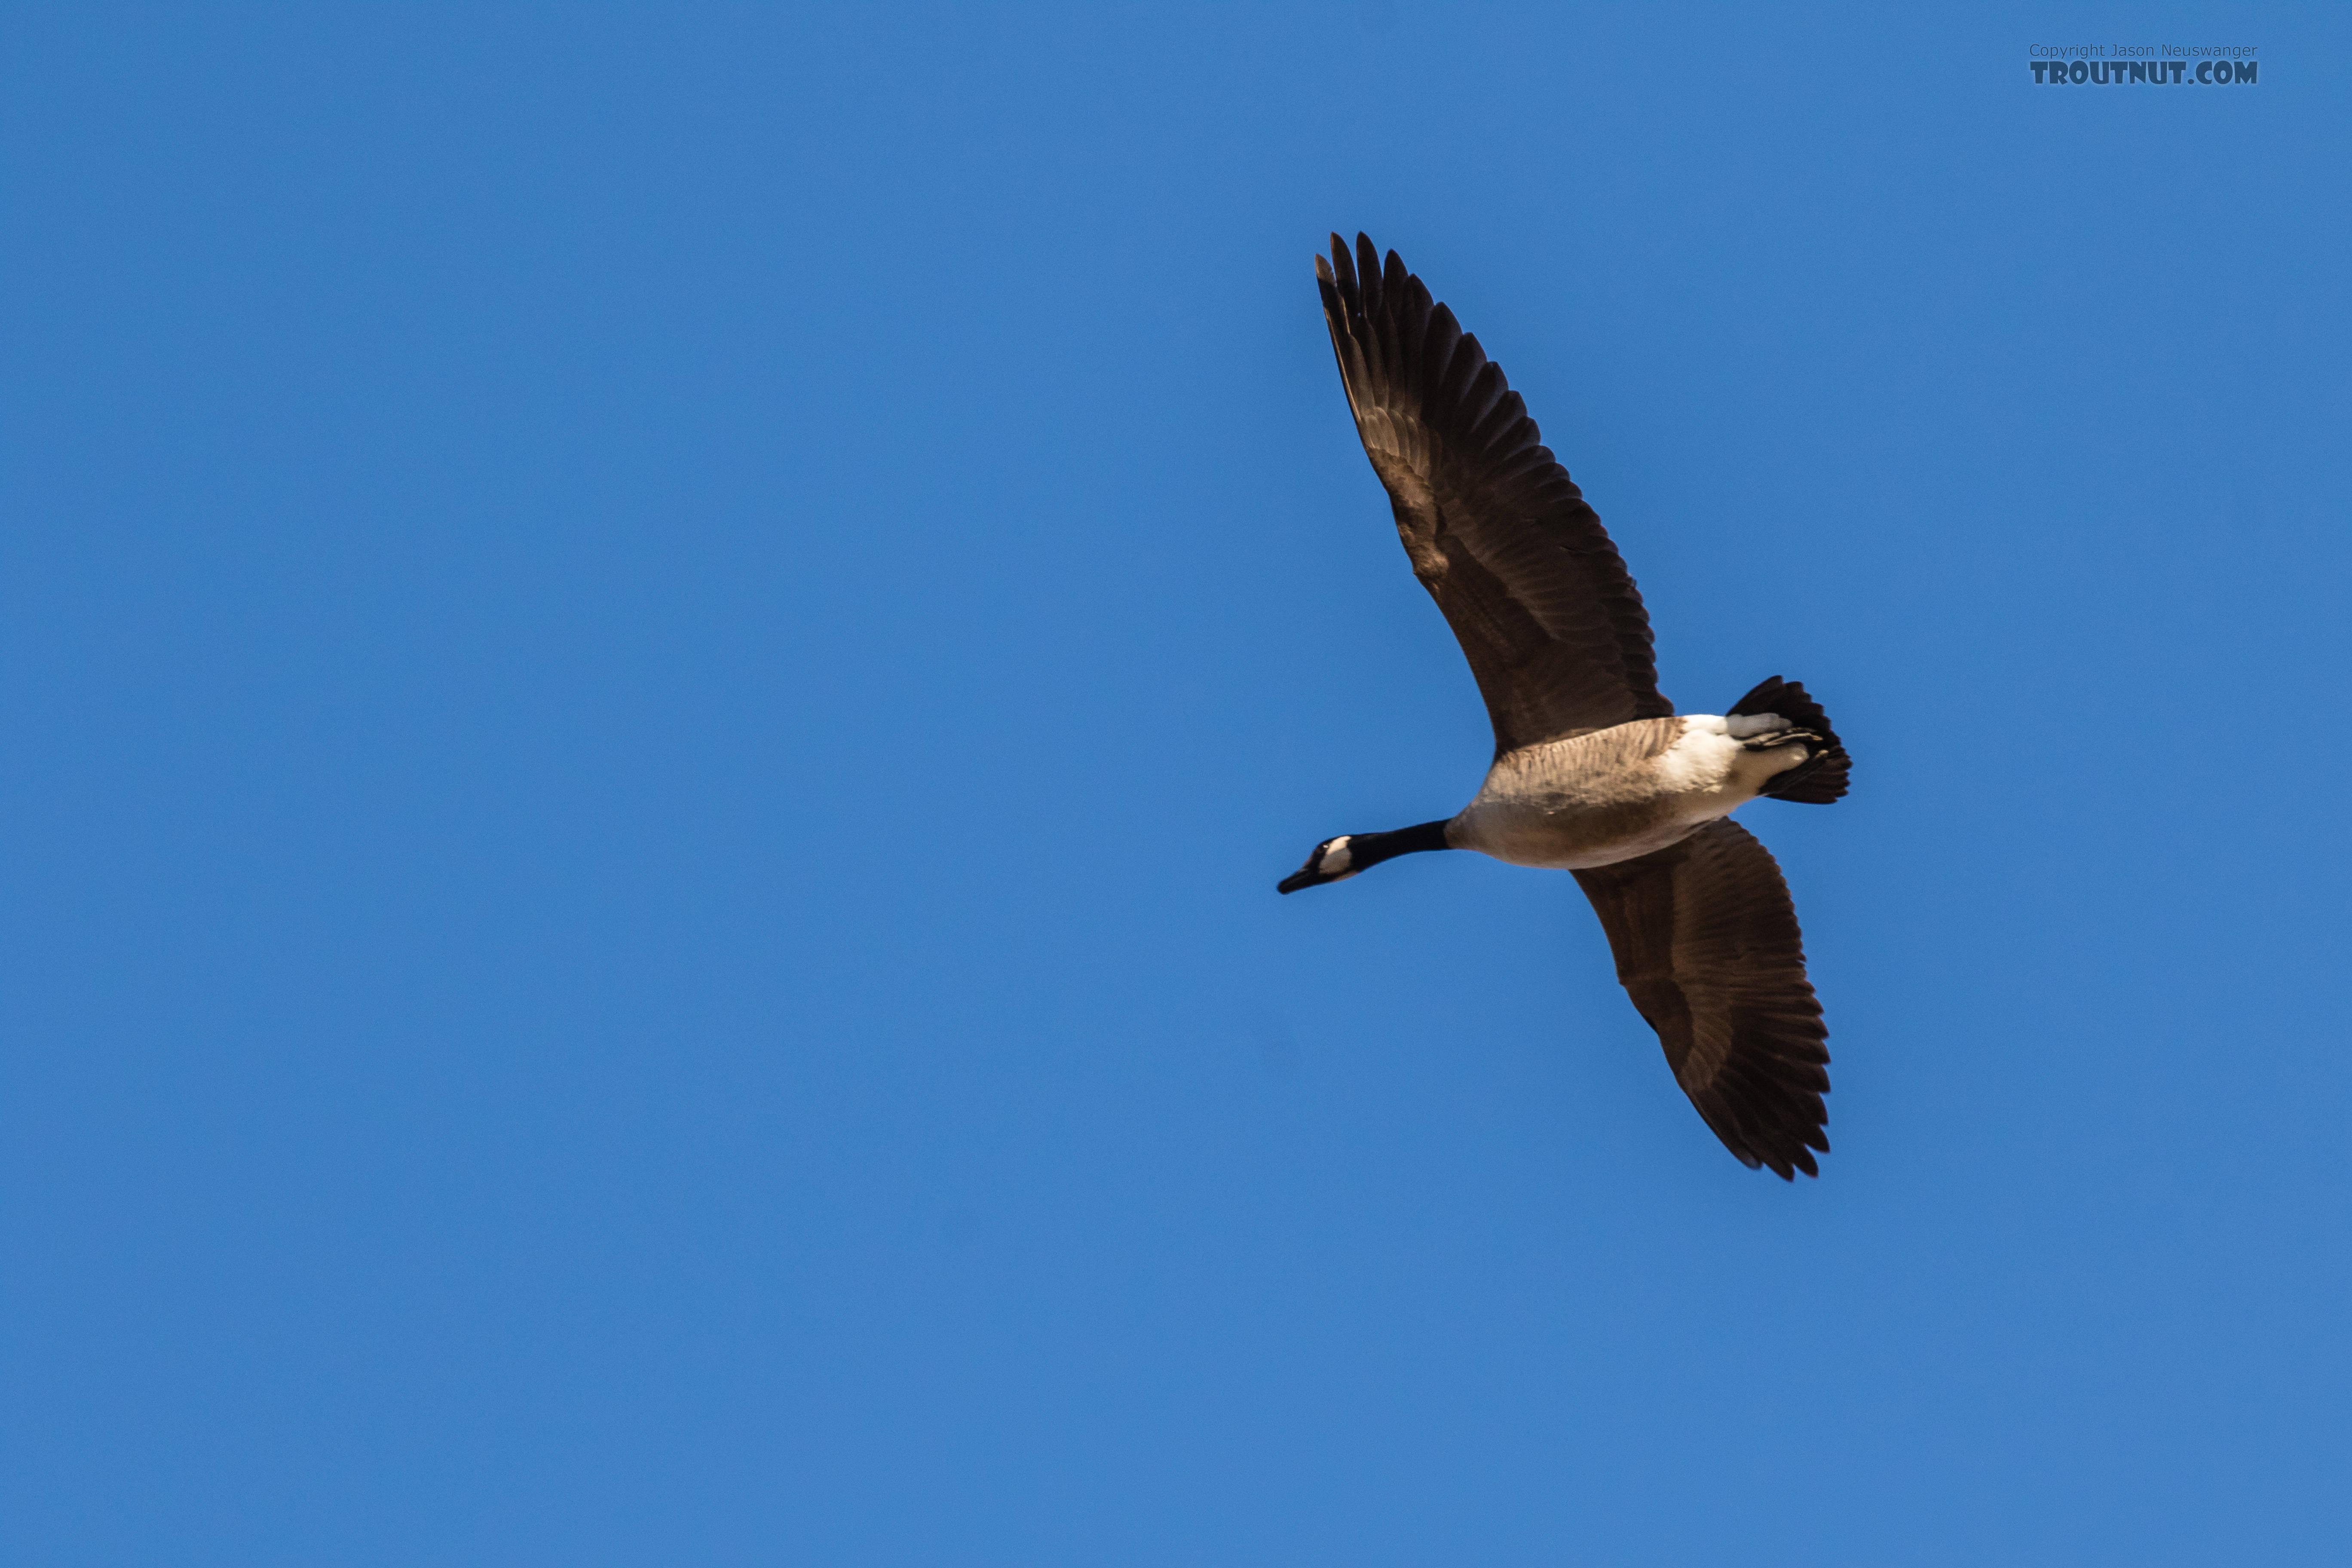 Canada goose returning to Fairbanks at Creamer's Field From Fairbanks in Alaska.